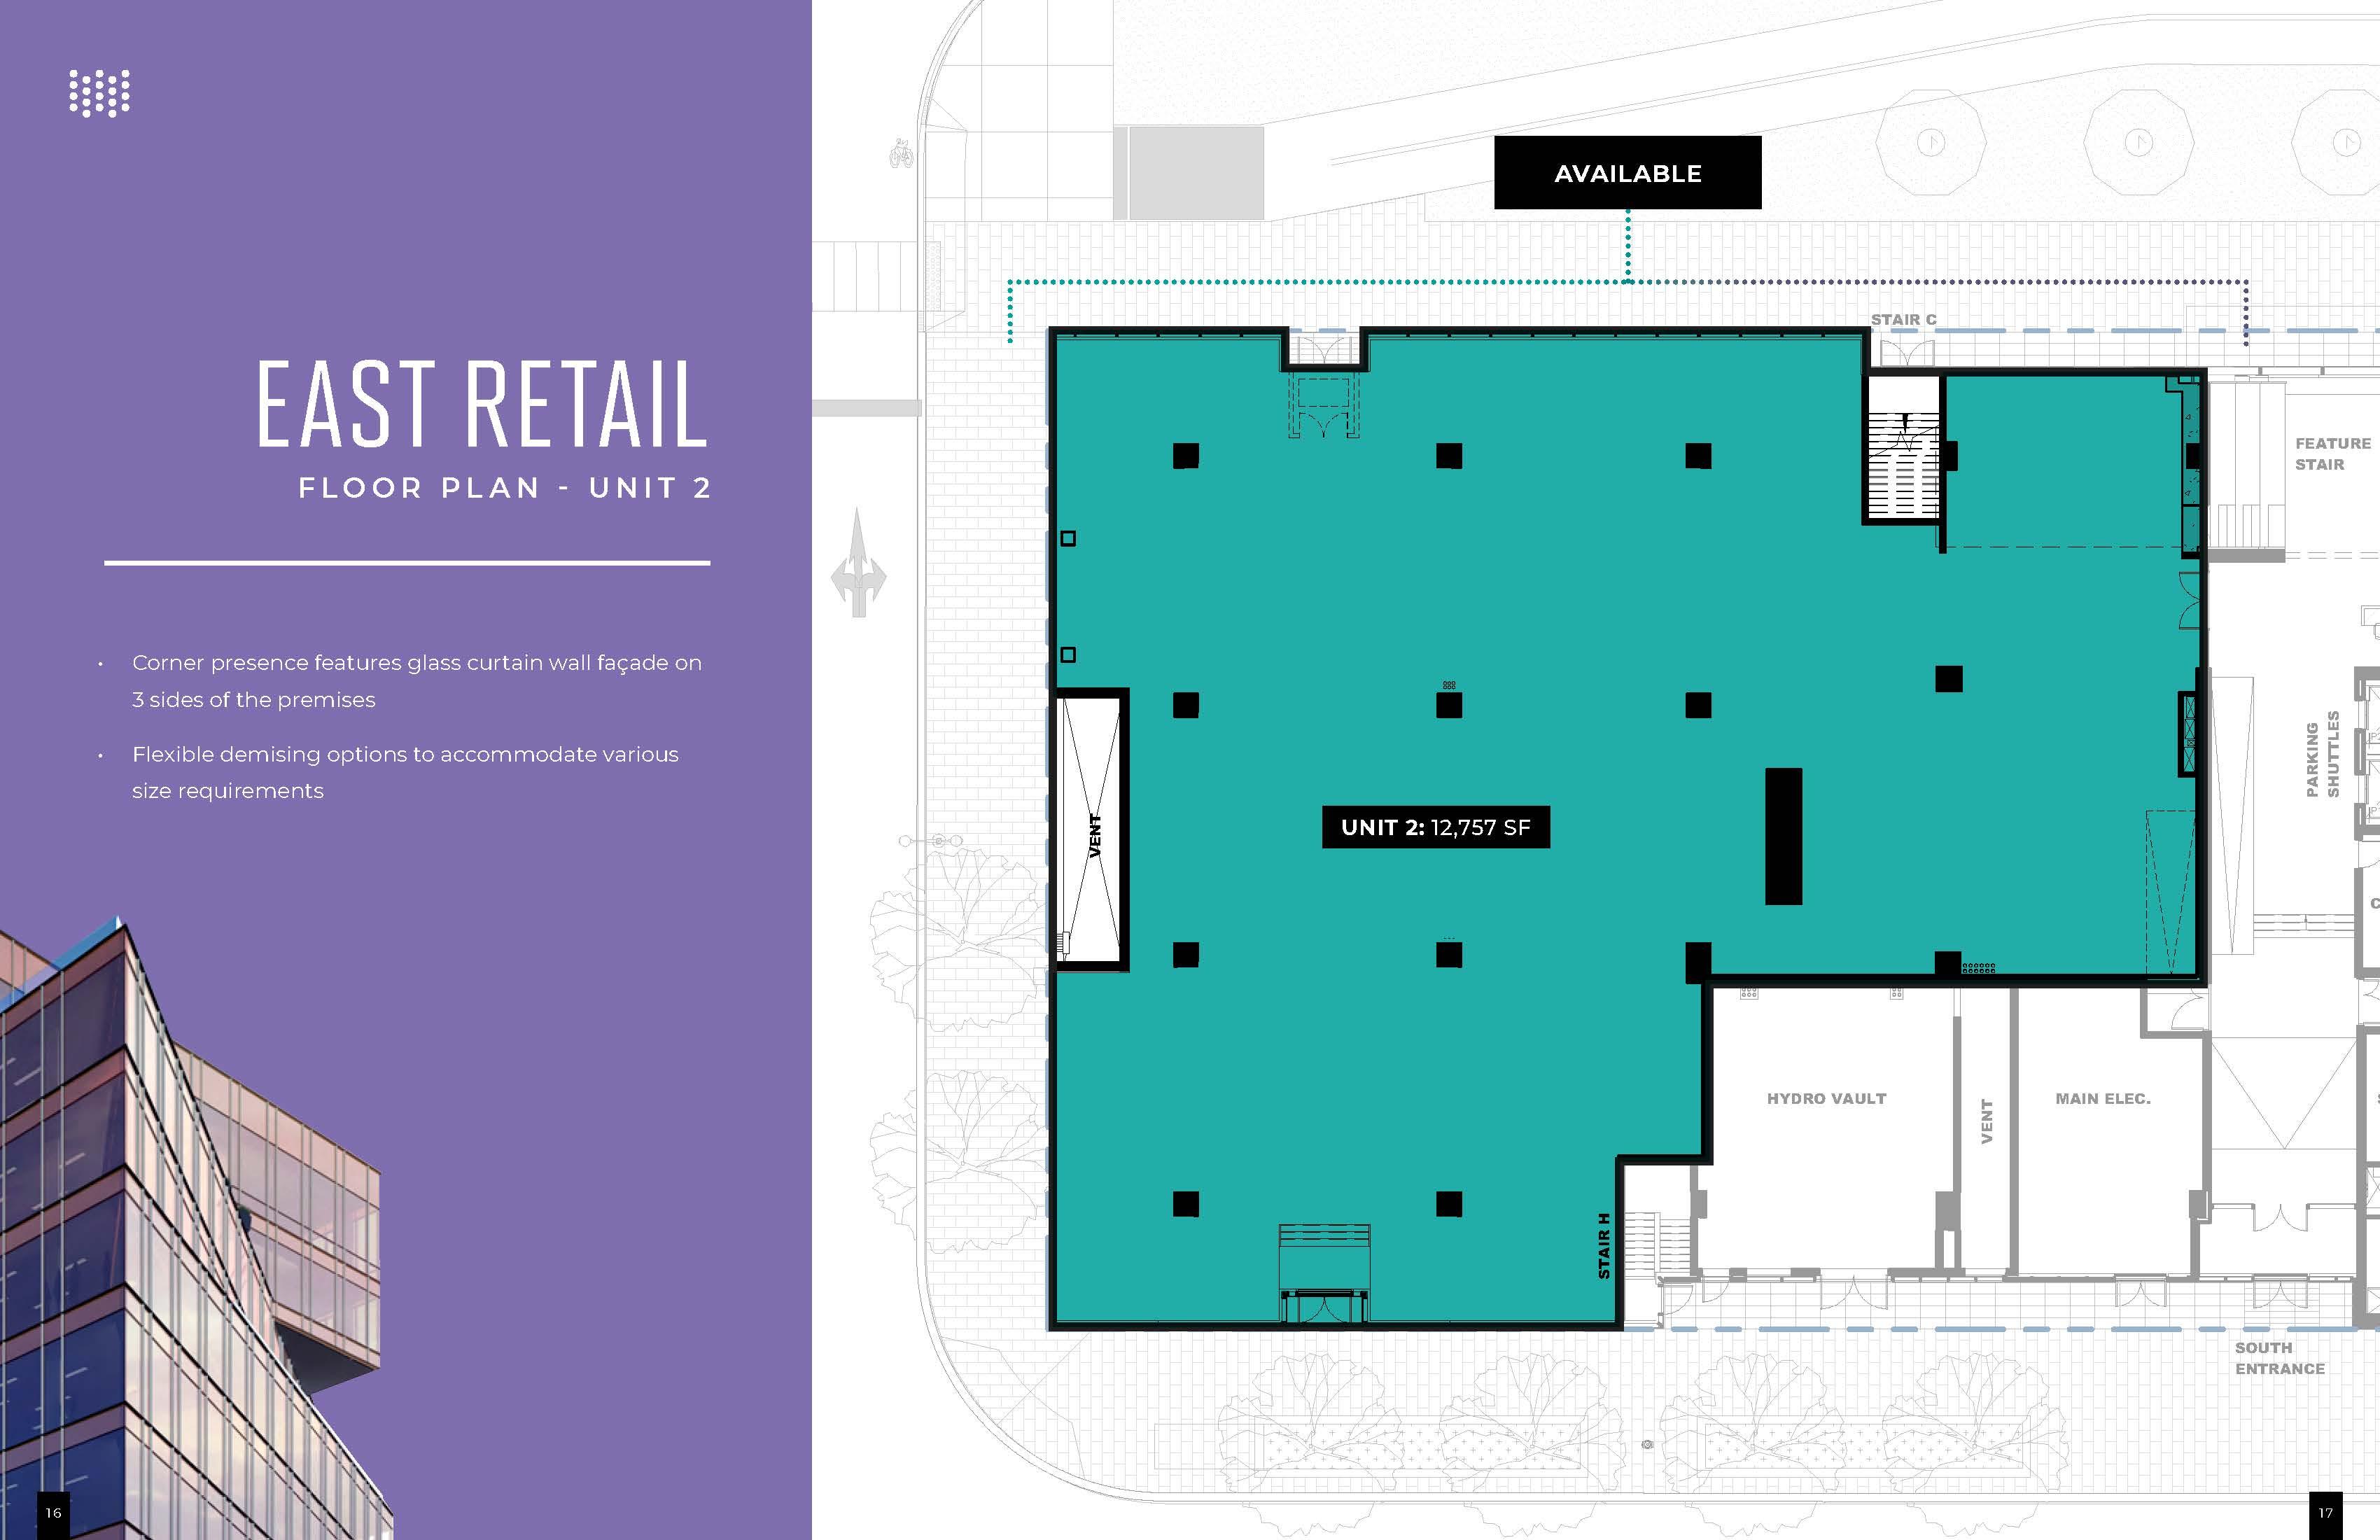 Floorplan thumbnail of East Retail Unit 2